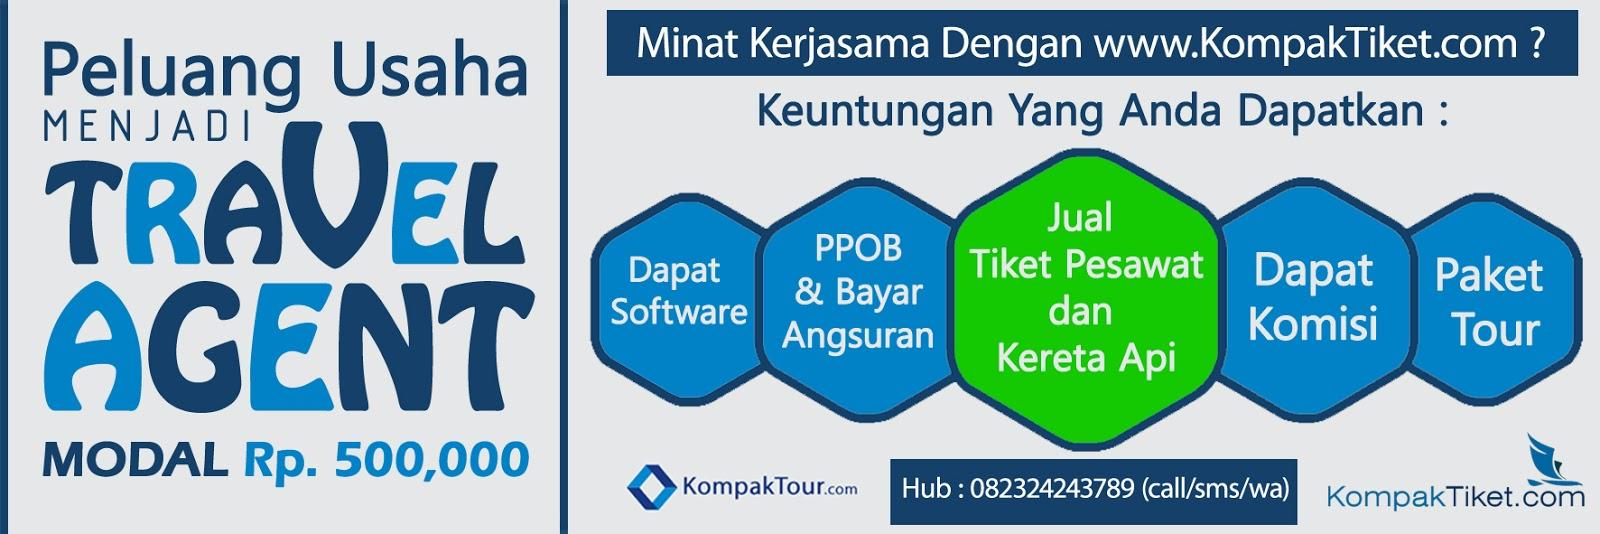 Peluang Bisnis Tour Travel Murah Open Trip Paket Wisata Bali 3h2m Ke Karimunjawabromoderawanmenjangan L Wa 085740601194